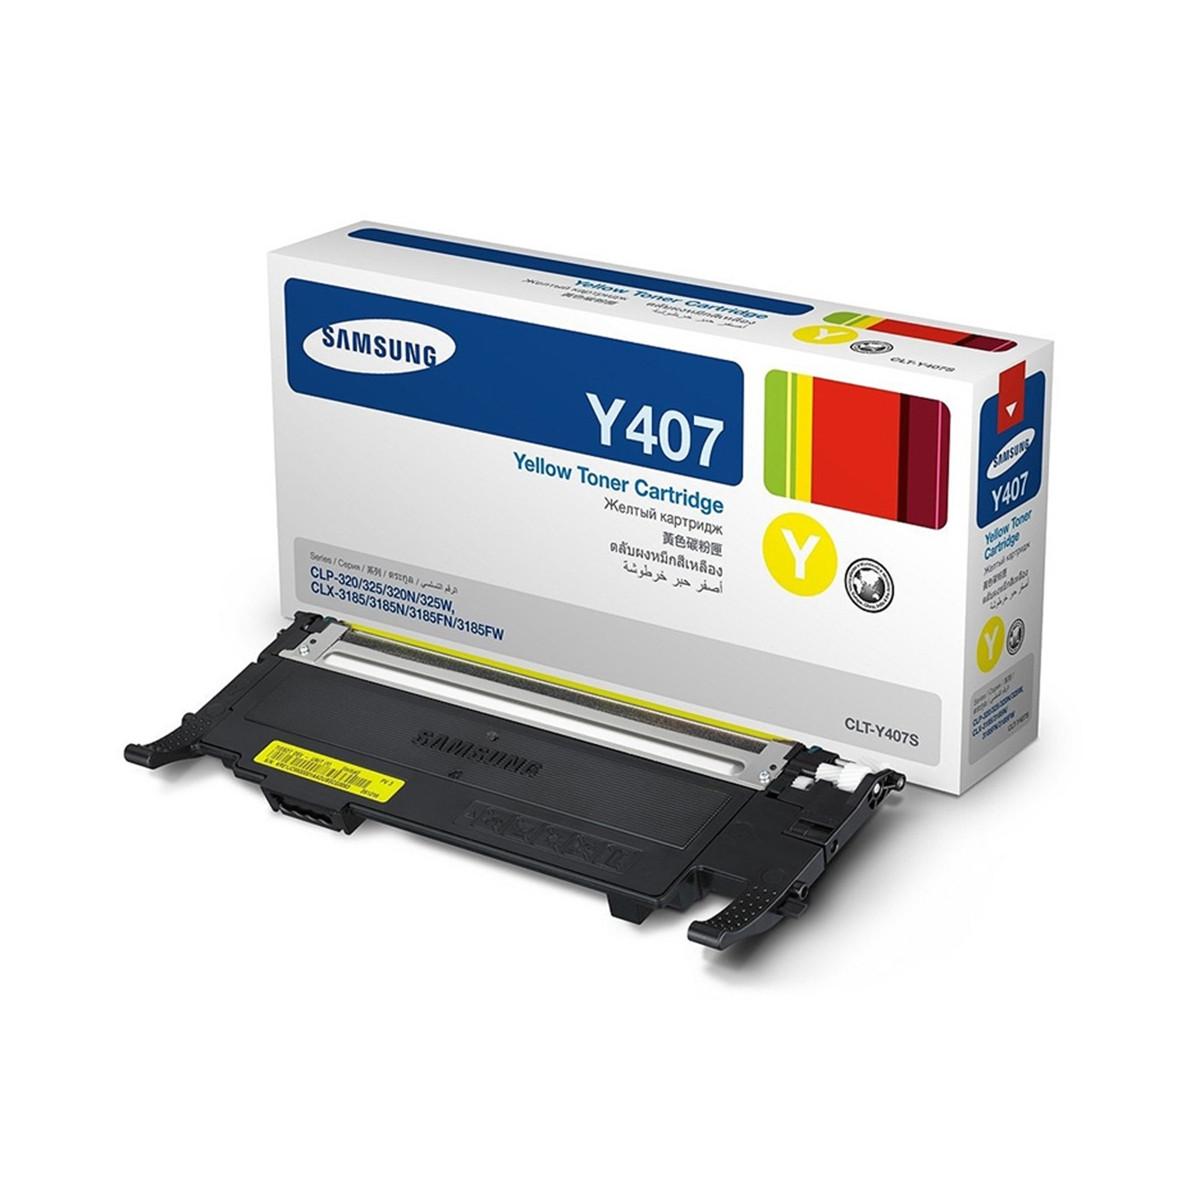 Toner Samsung CLT-Y407S/XAA CLT-Y407S Amarelo | CLP325W CLX3185N CLP-325 CLX-3185FW | Original 1k